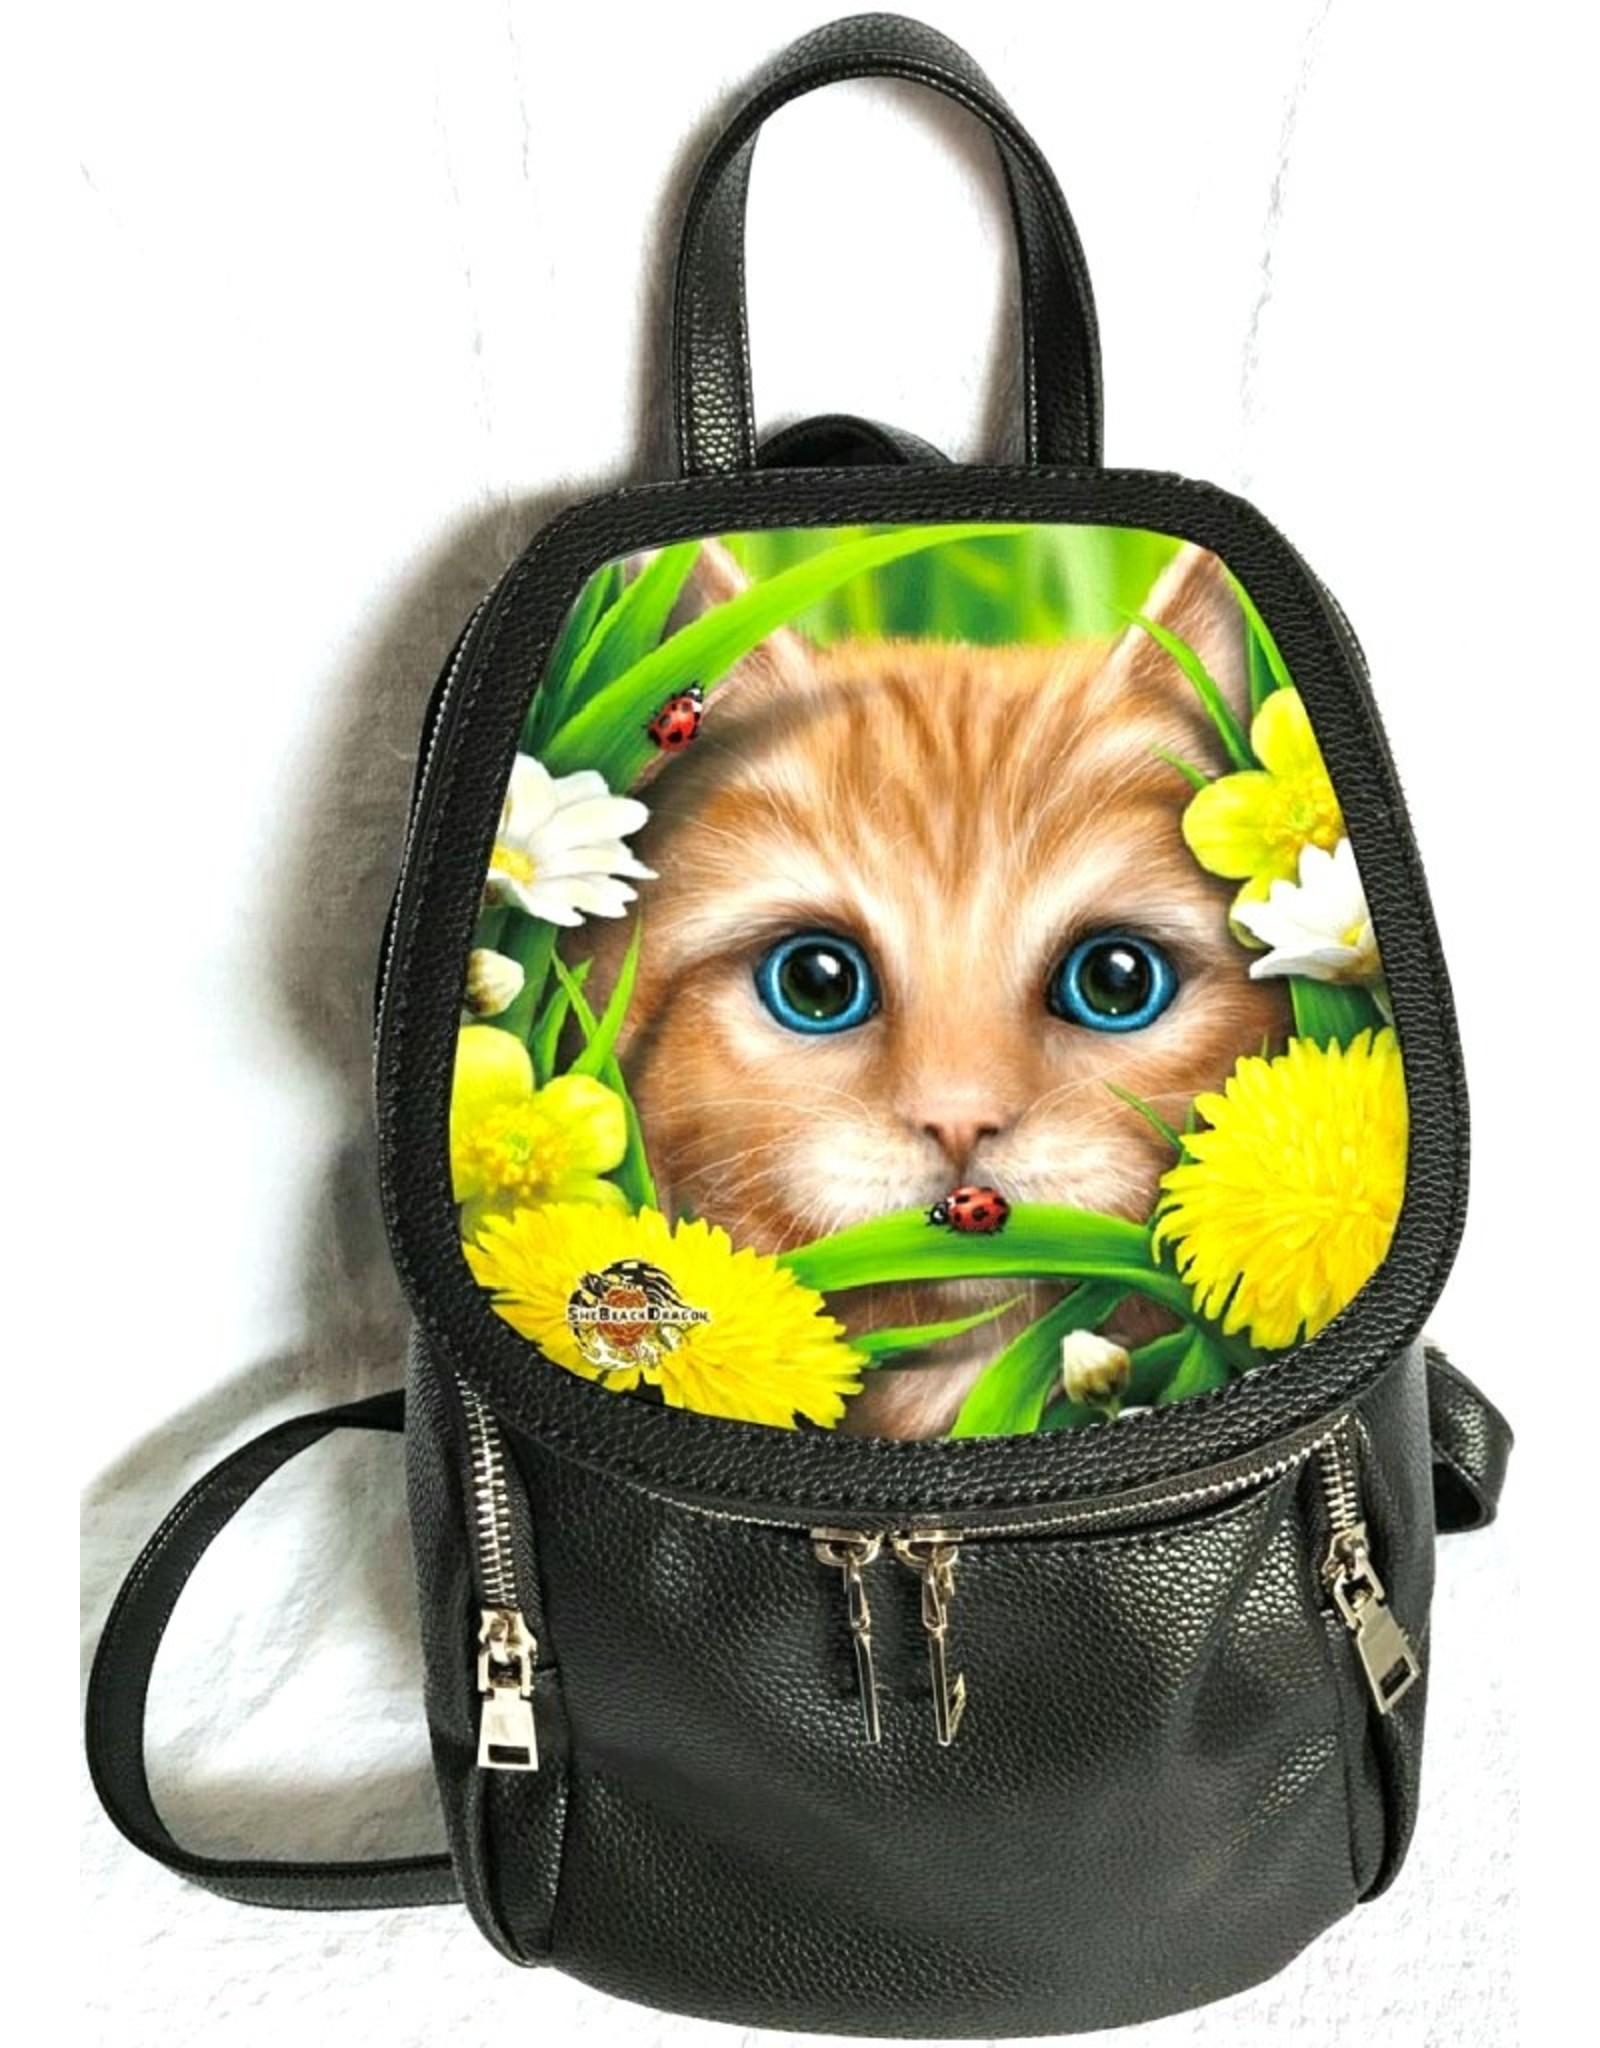 SheBlackDragon 3D Bags and Backpacks - Linda M. Jones Summer Cat Backpack 3D